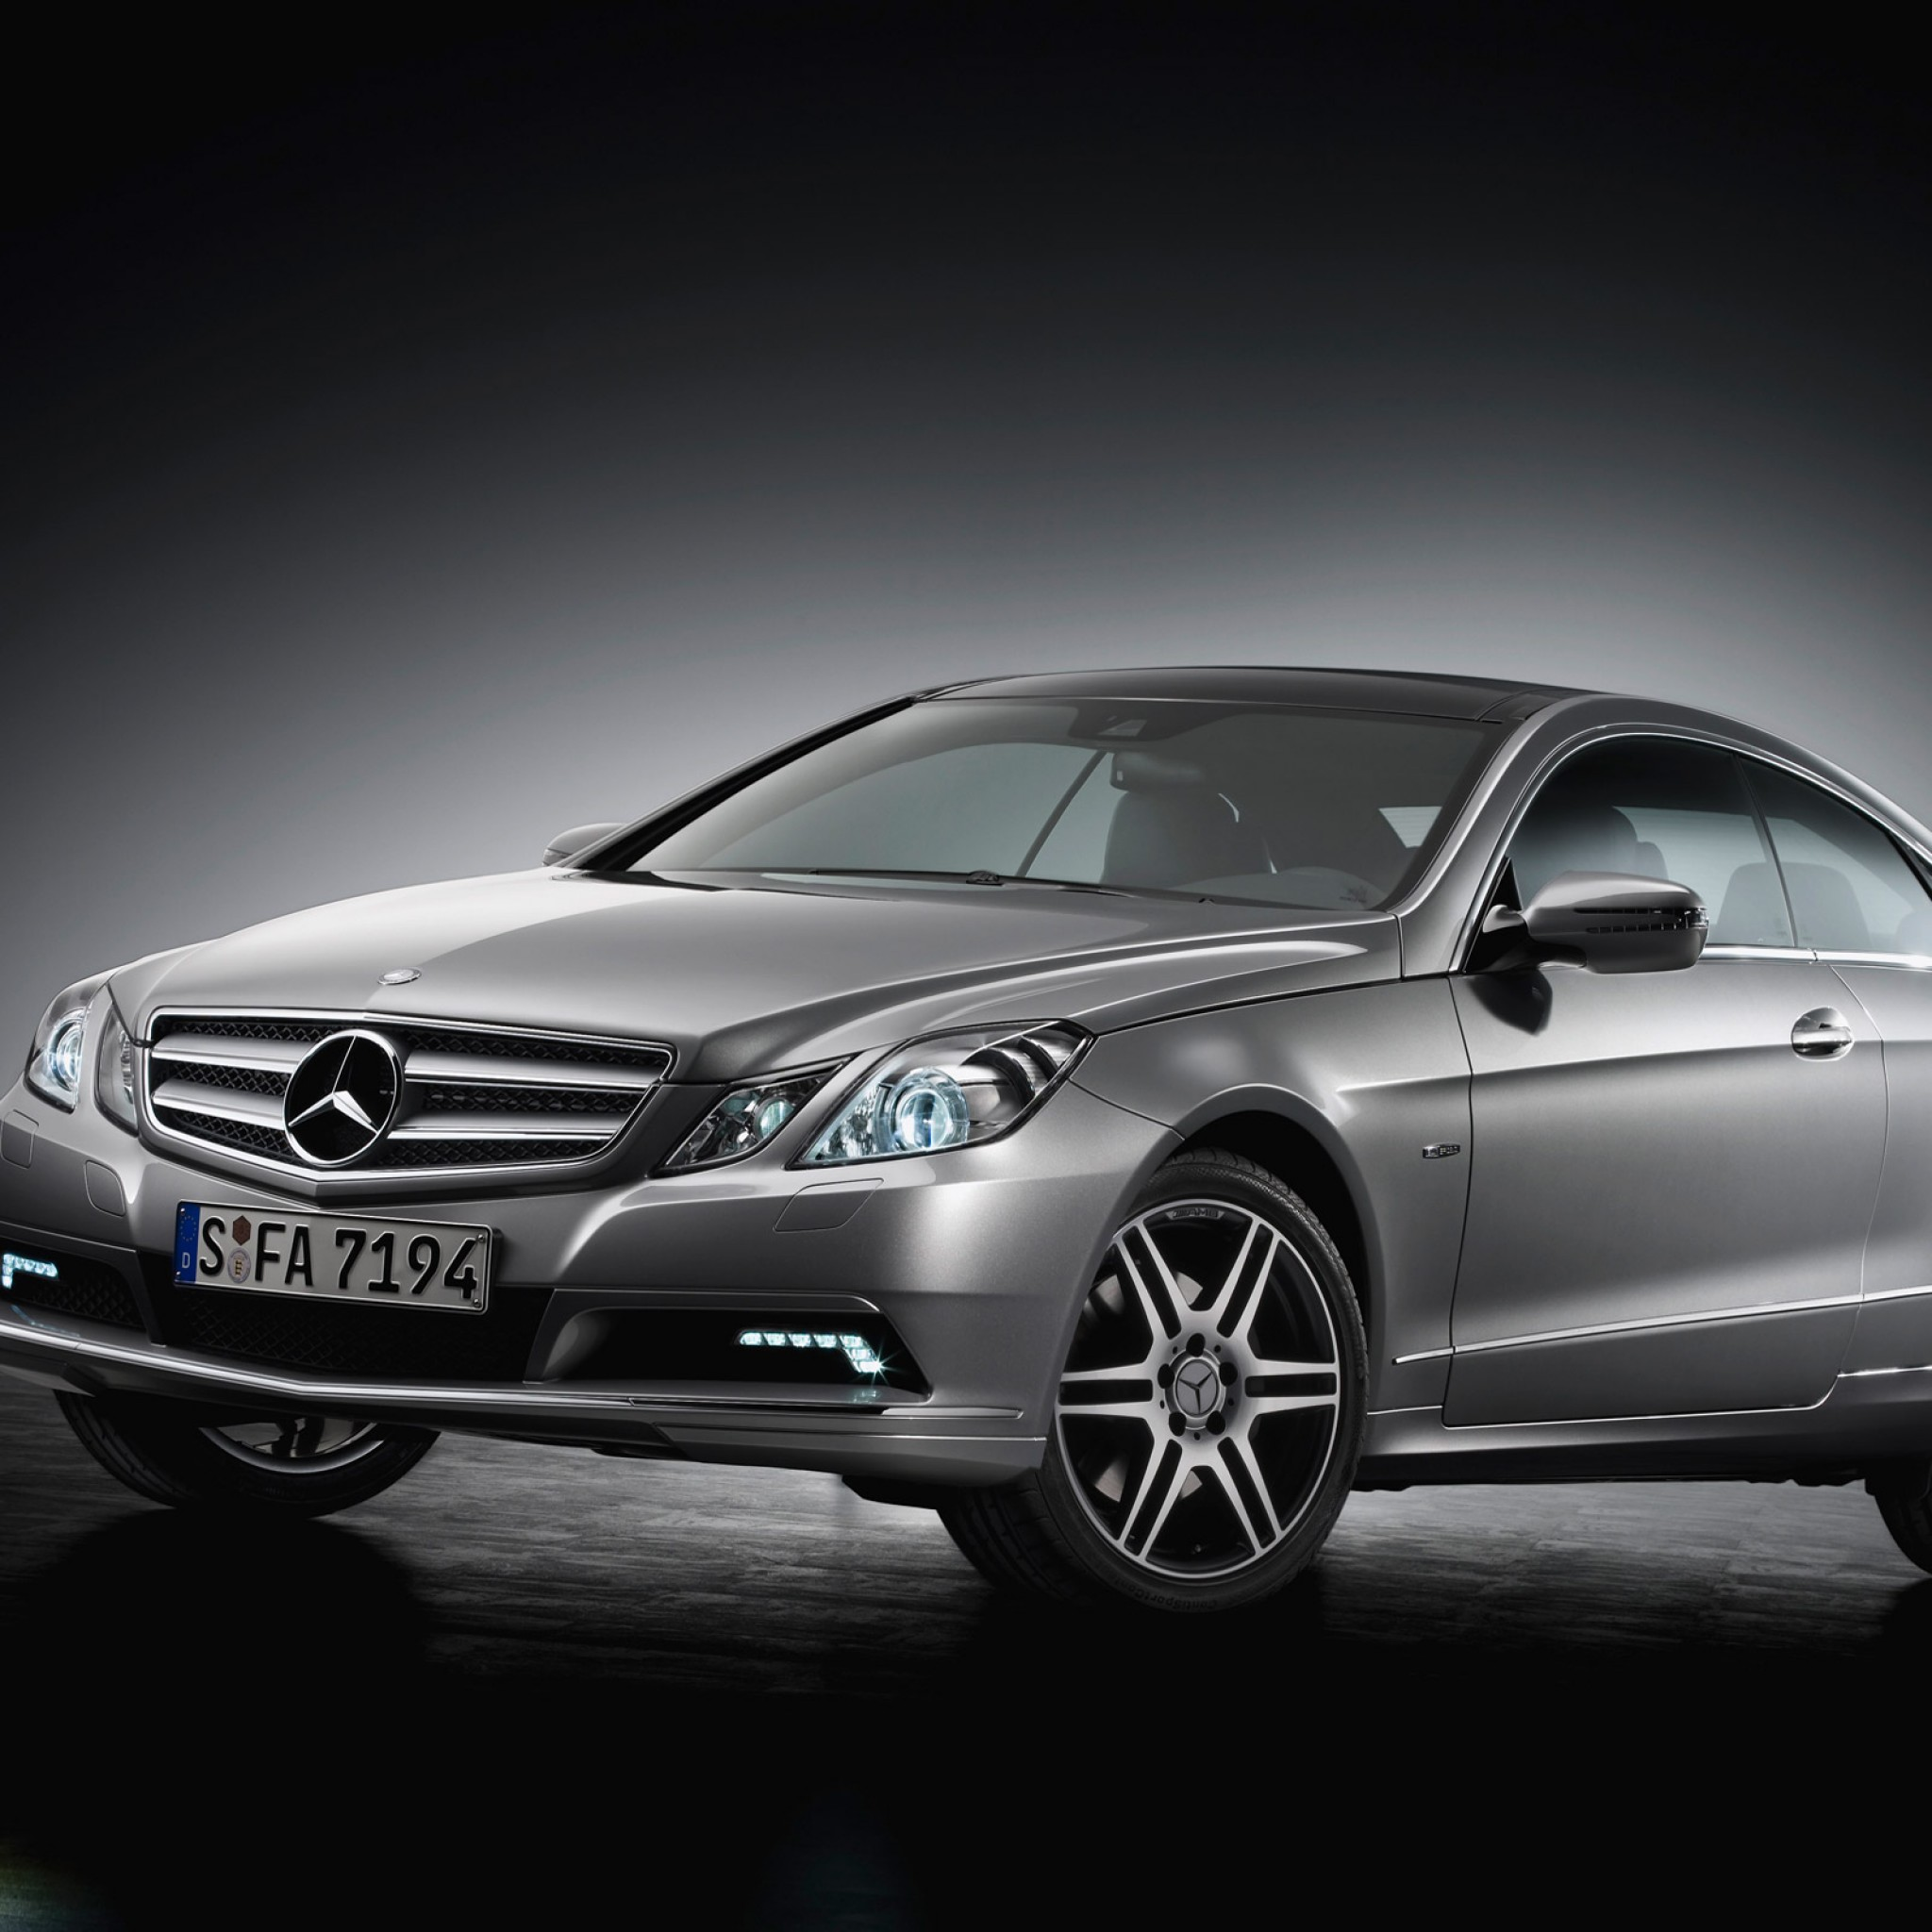 Mercedes benz e class history photos on better parts ltd for Mercedes benz automobile parts